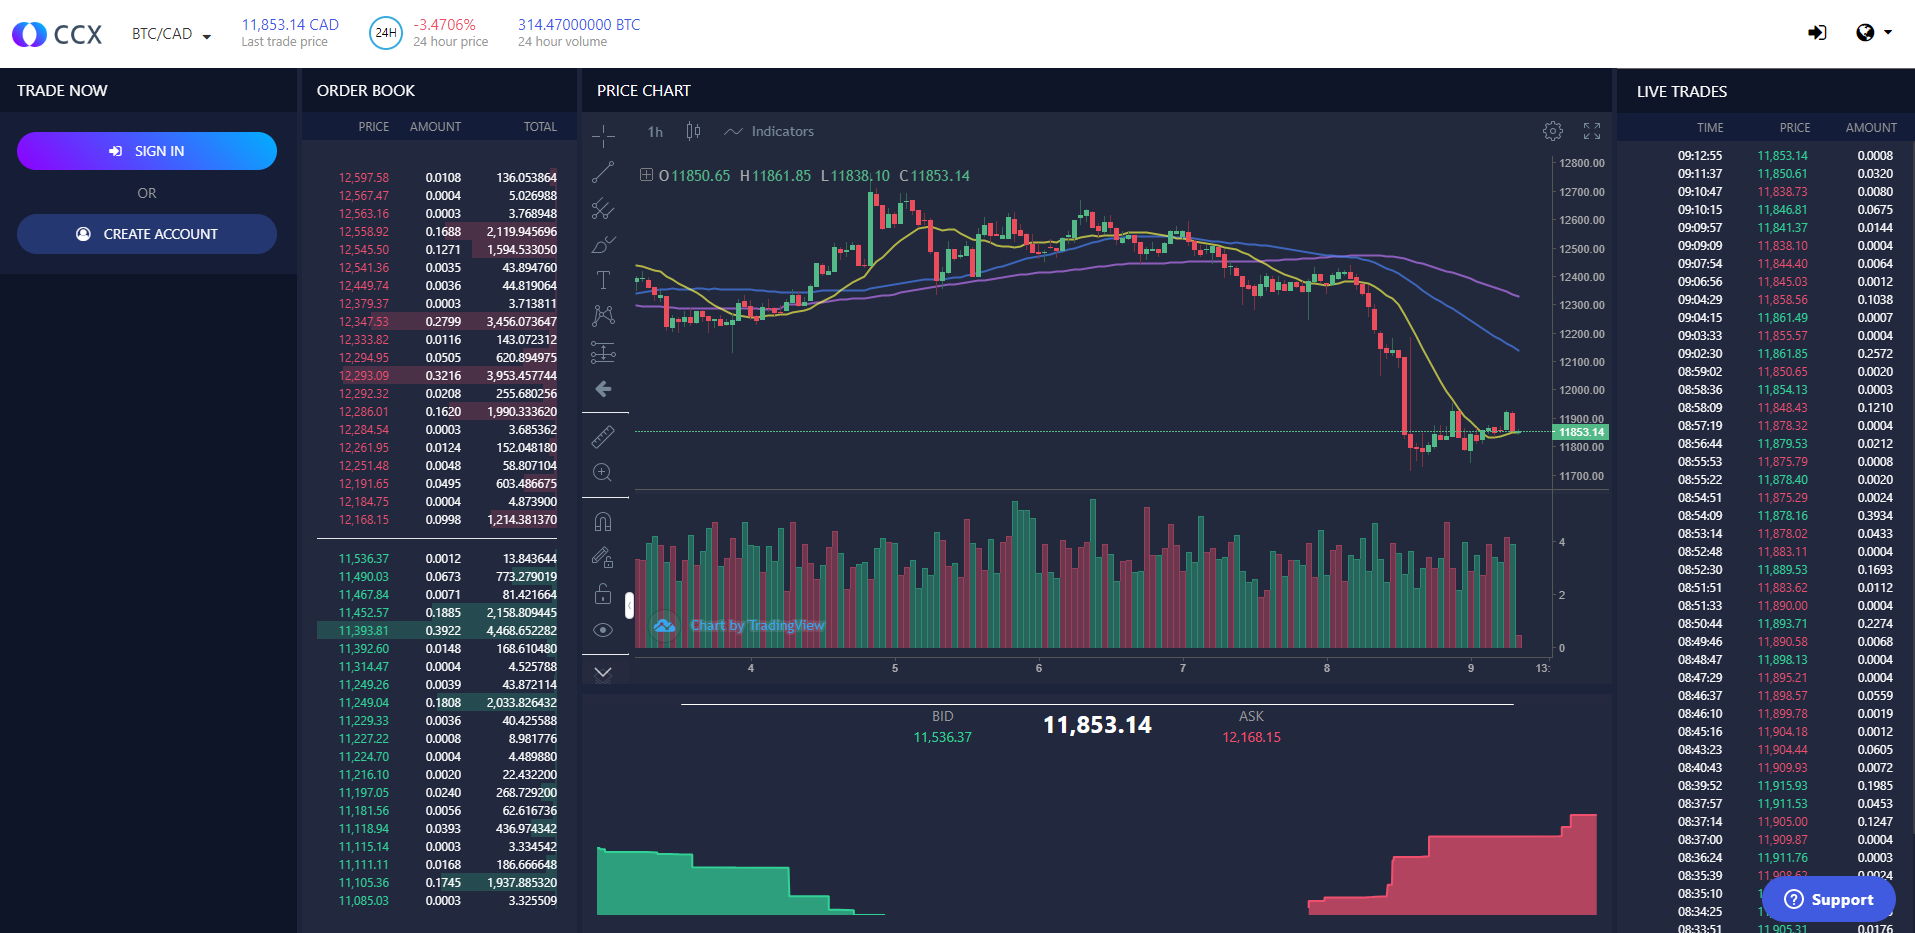 CCXCanada Trading View